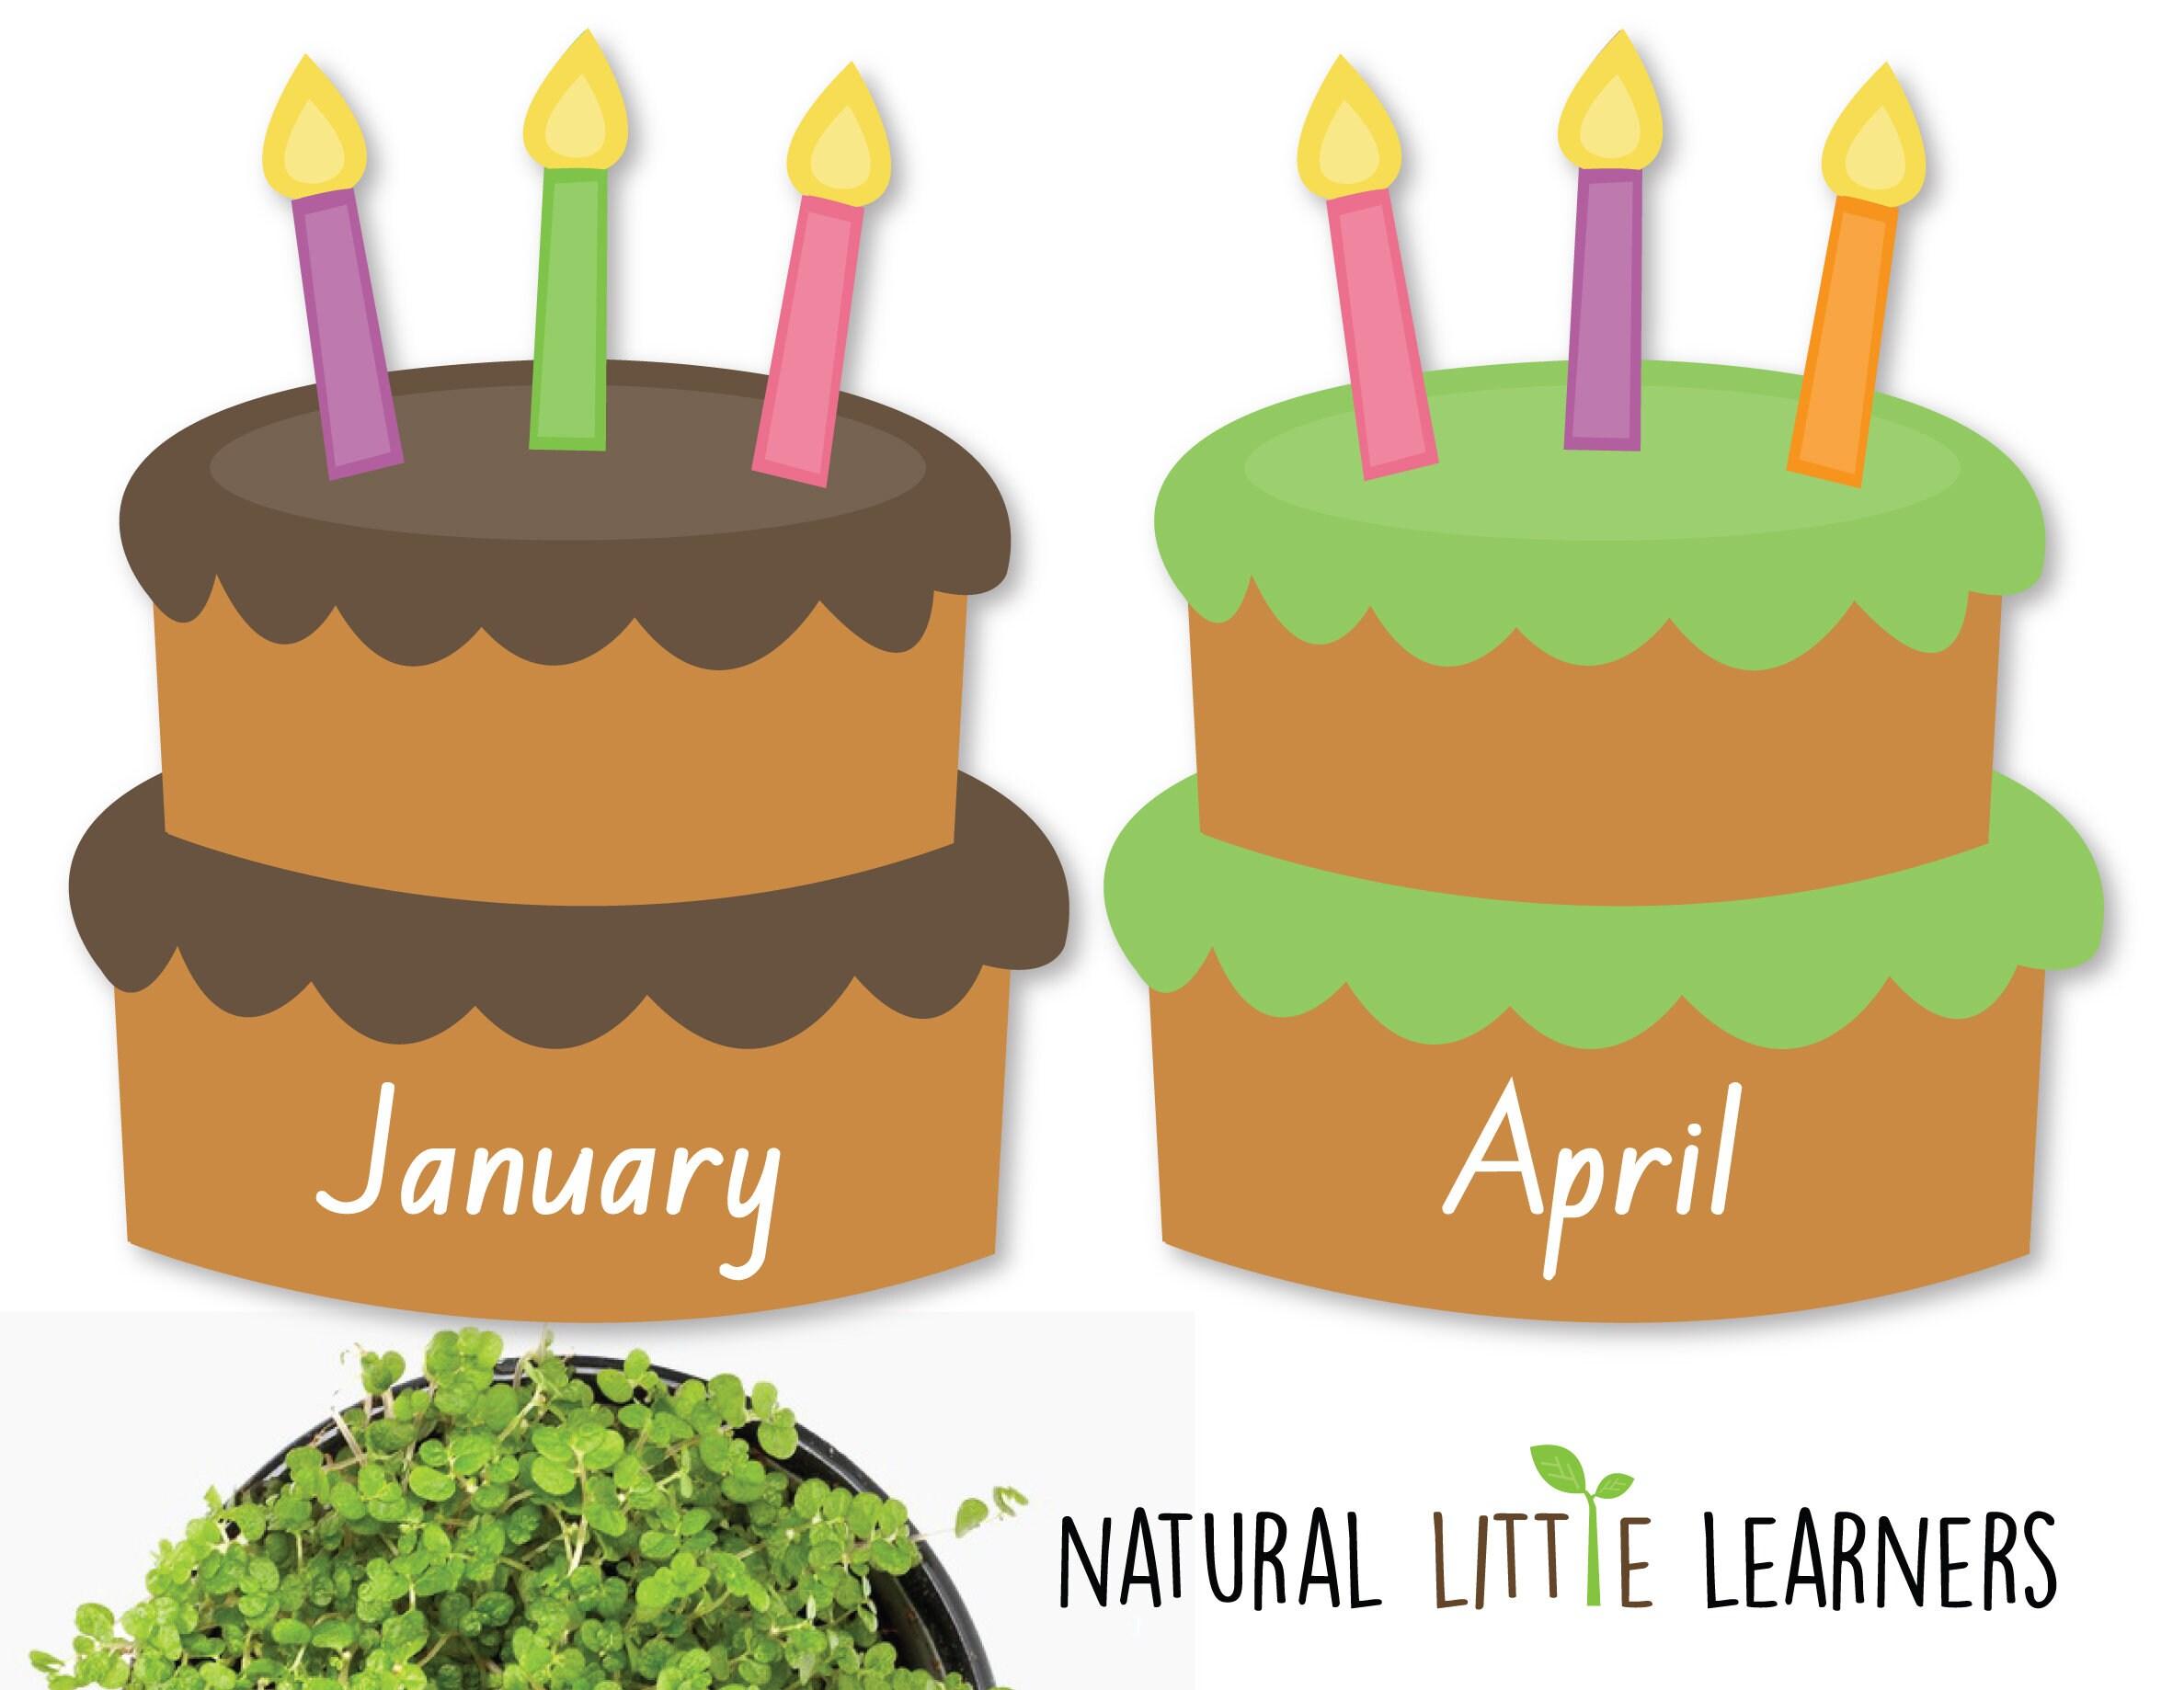 Birthday Cake Birthday Chart Room Decor Preschool Decor Etsy